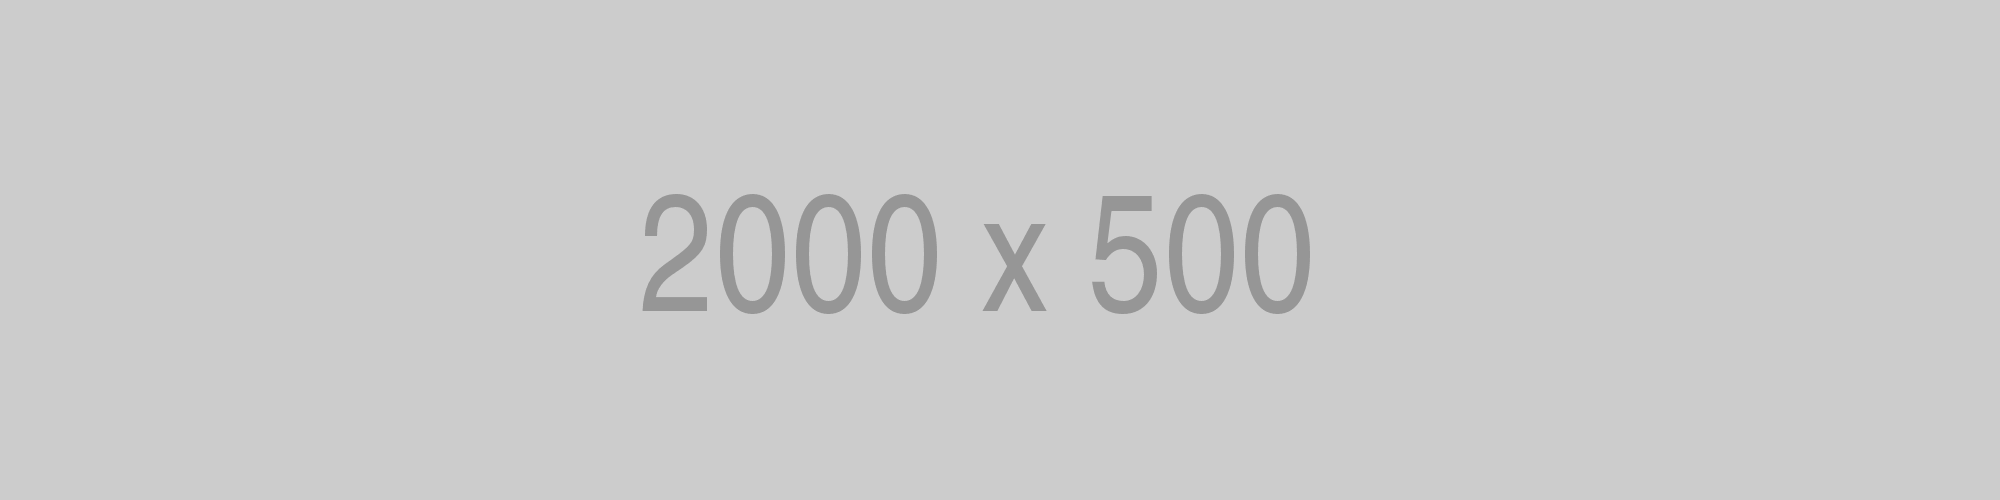 2000x500